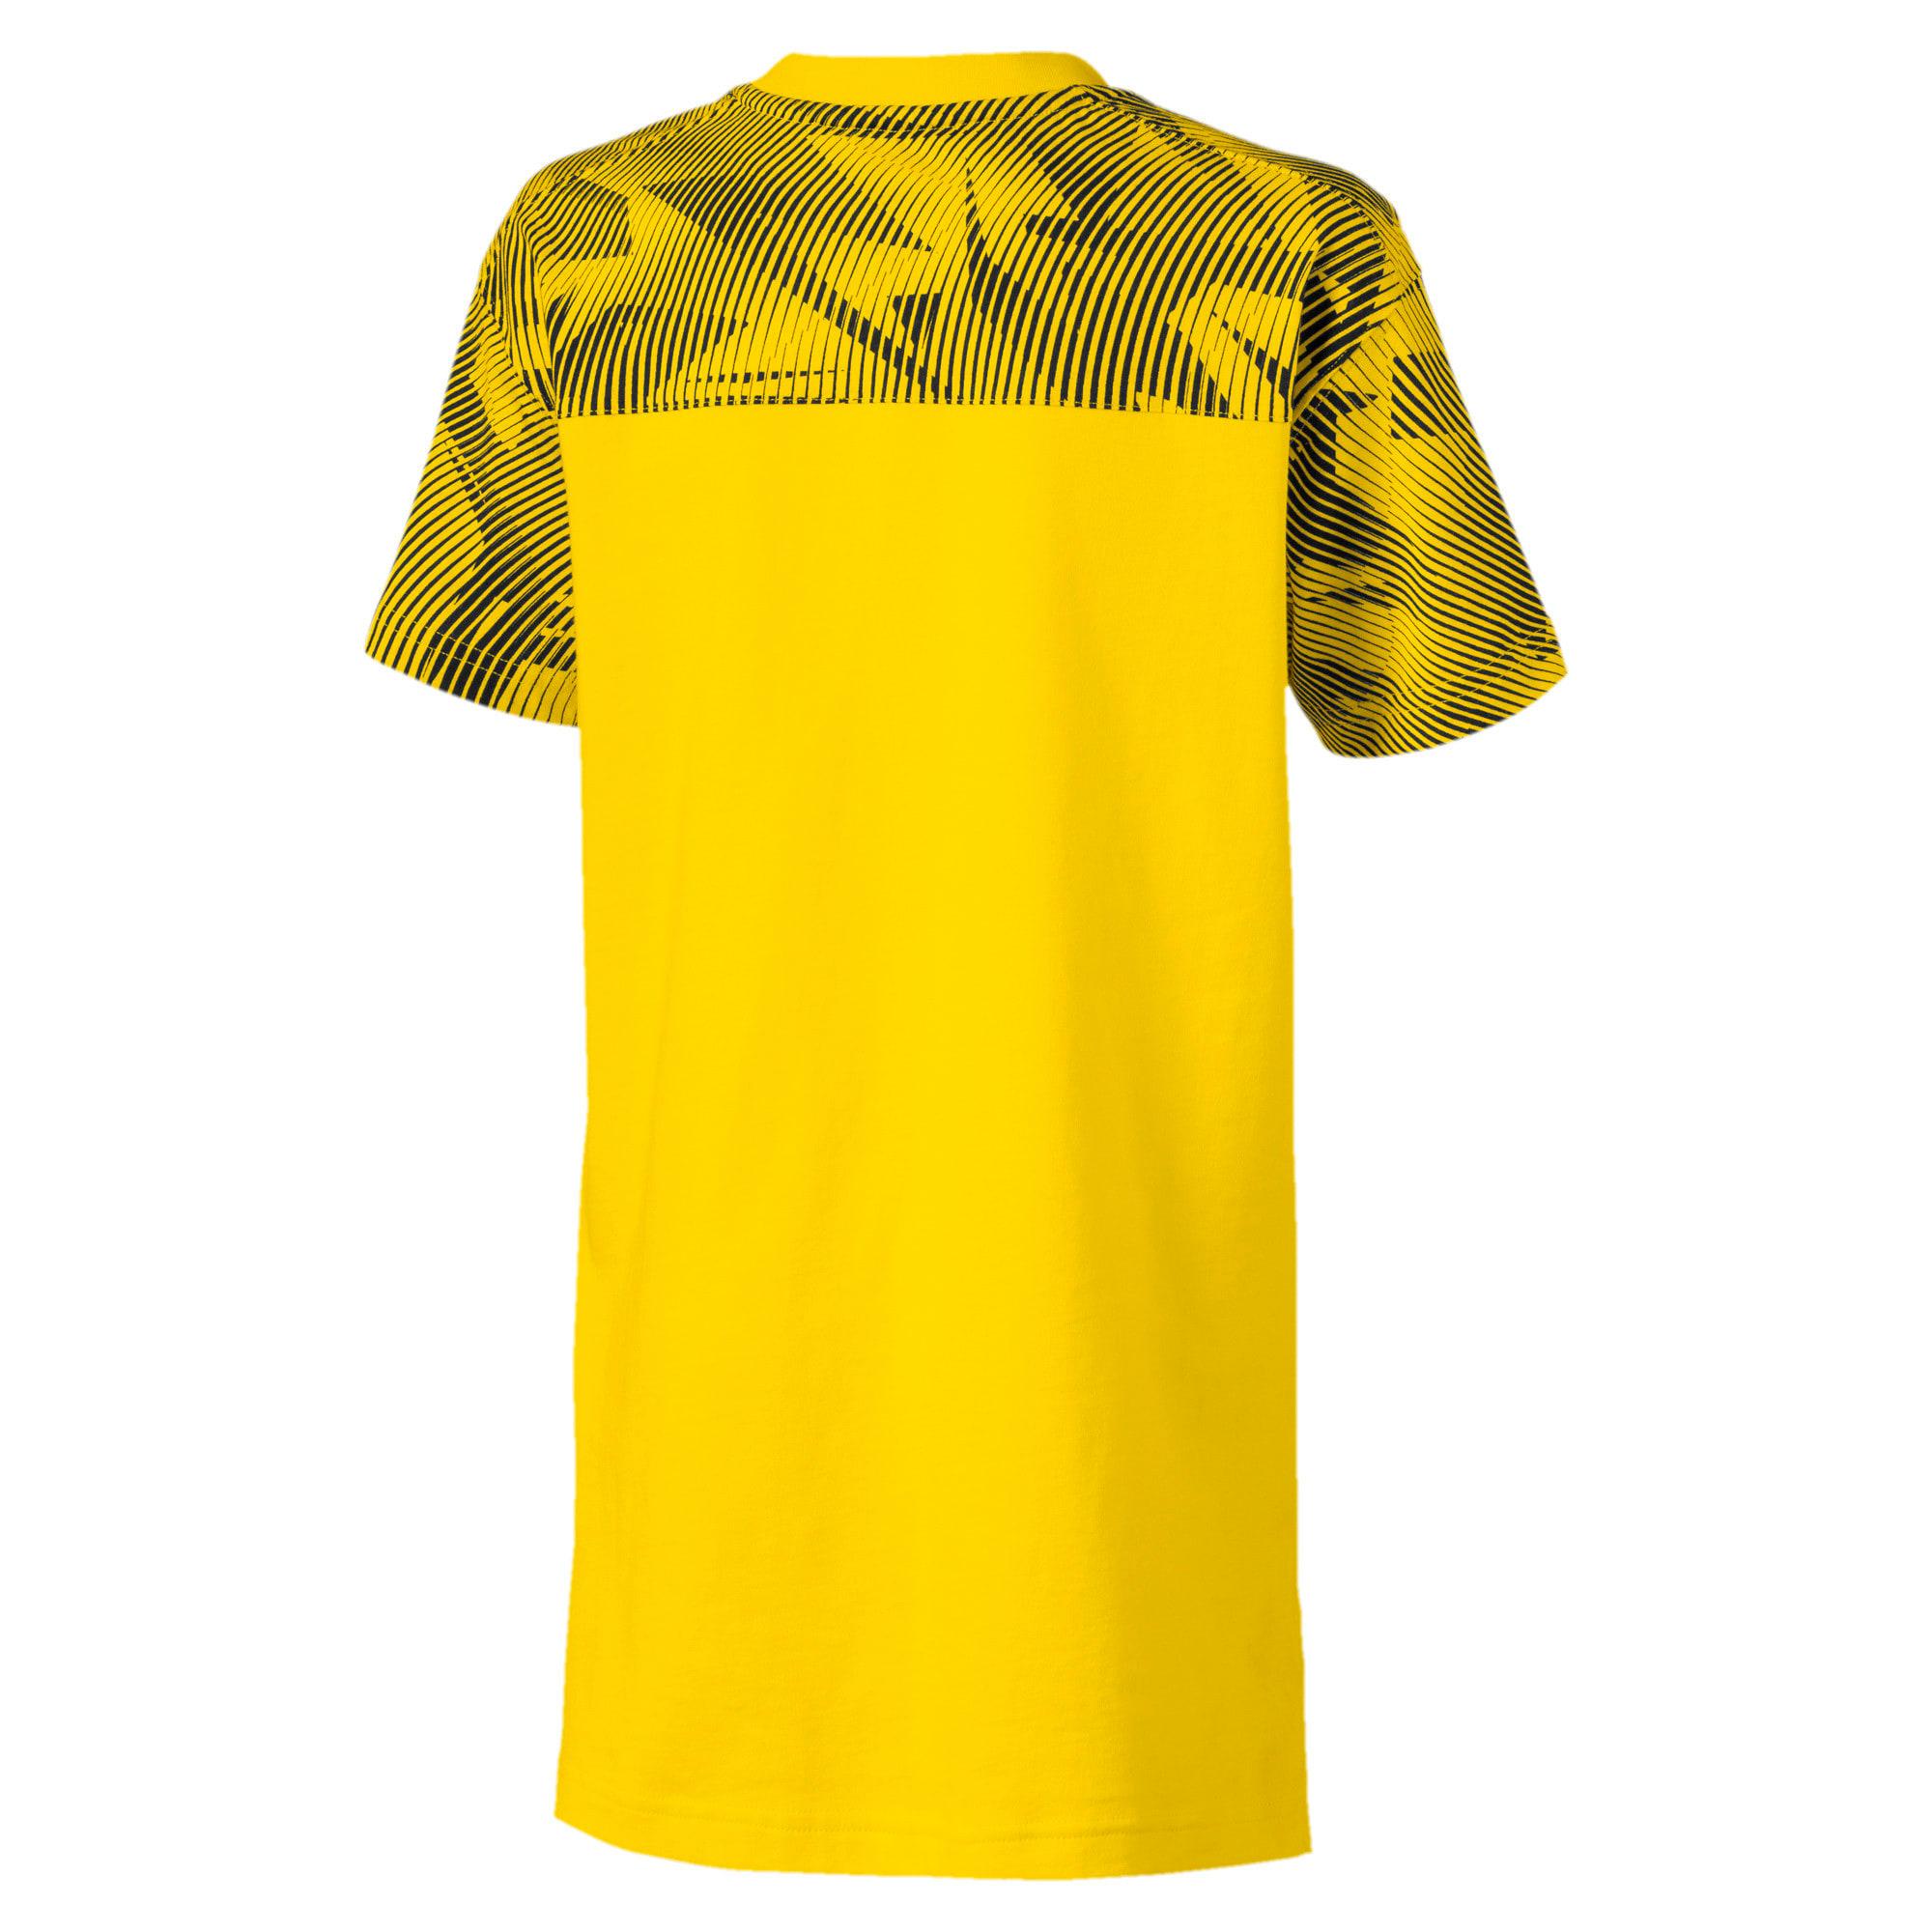 Thumbnail 2 of BVB Casuals Kinder T-Shirt, Cyber Yellow-Puma Black, medium